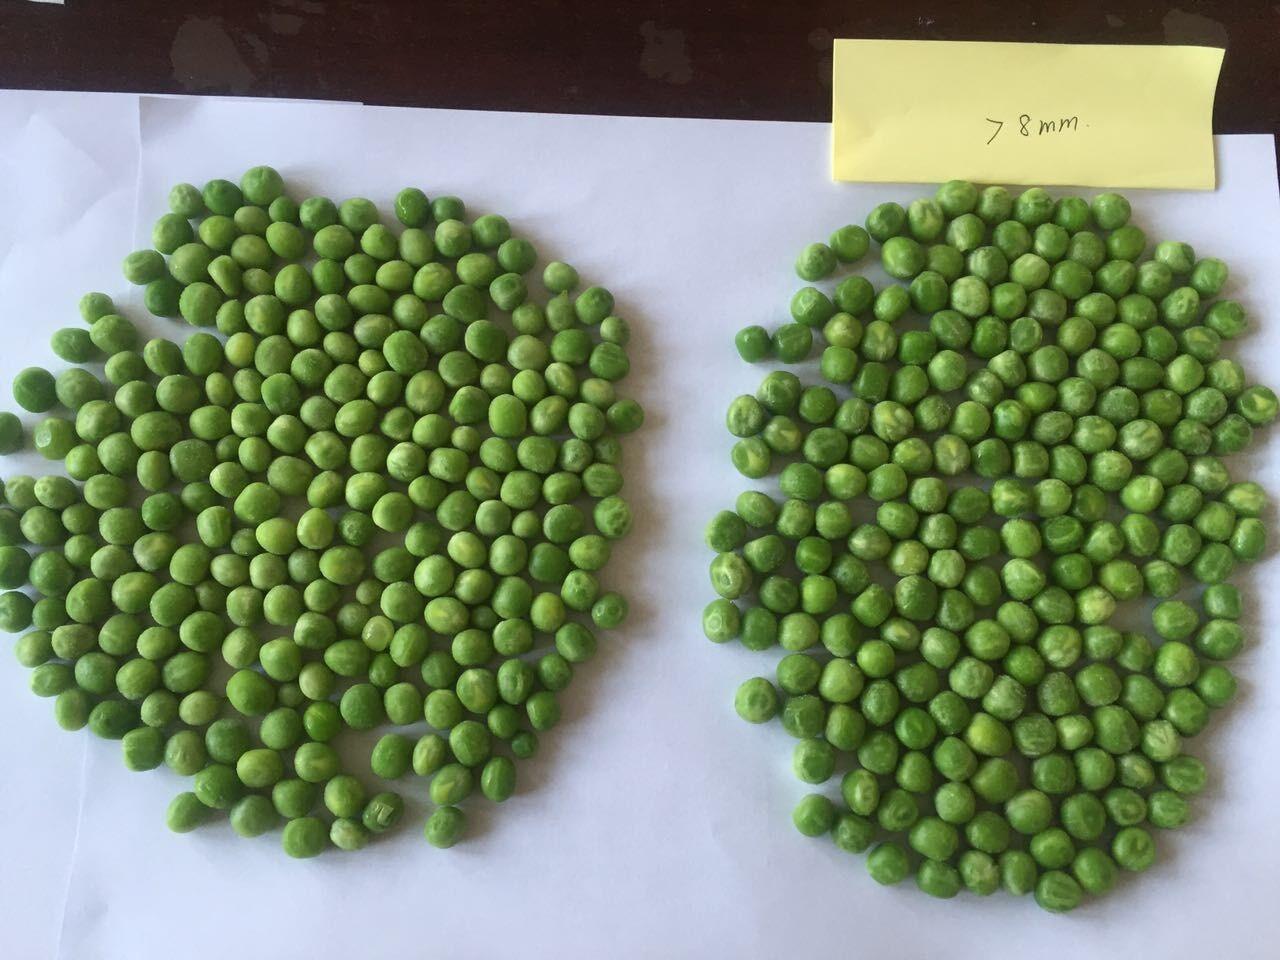 IQF Frozen Green Pea Manufacturers, IQF Frozen Green Pea Factory, Supply IQF Frozen Green Pea